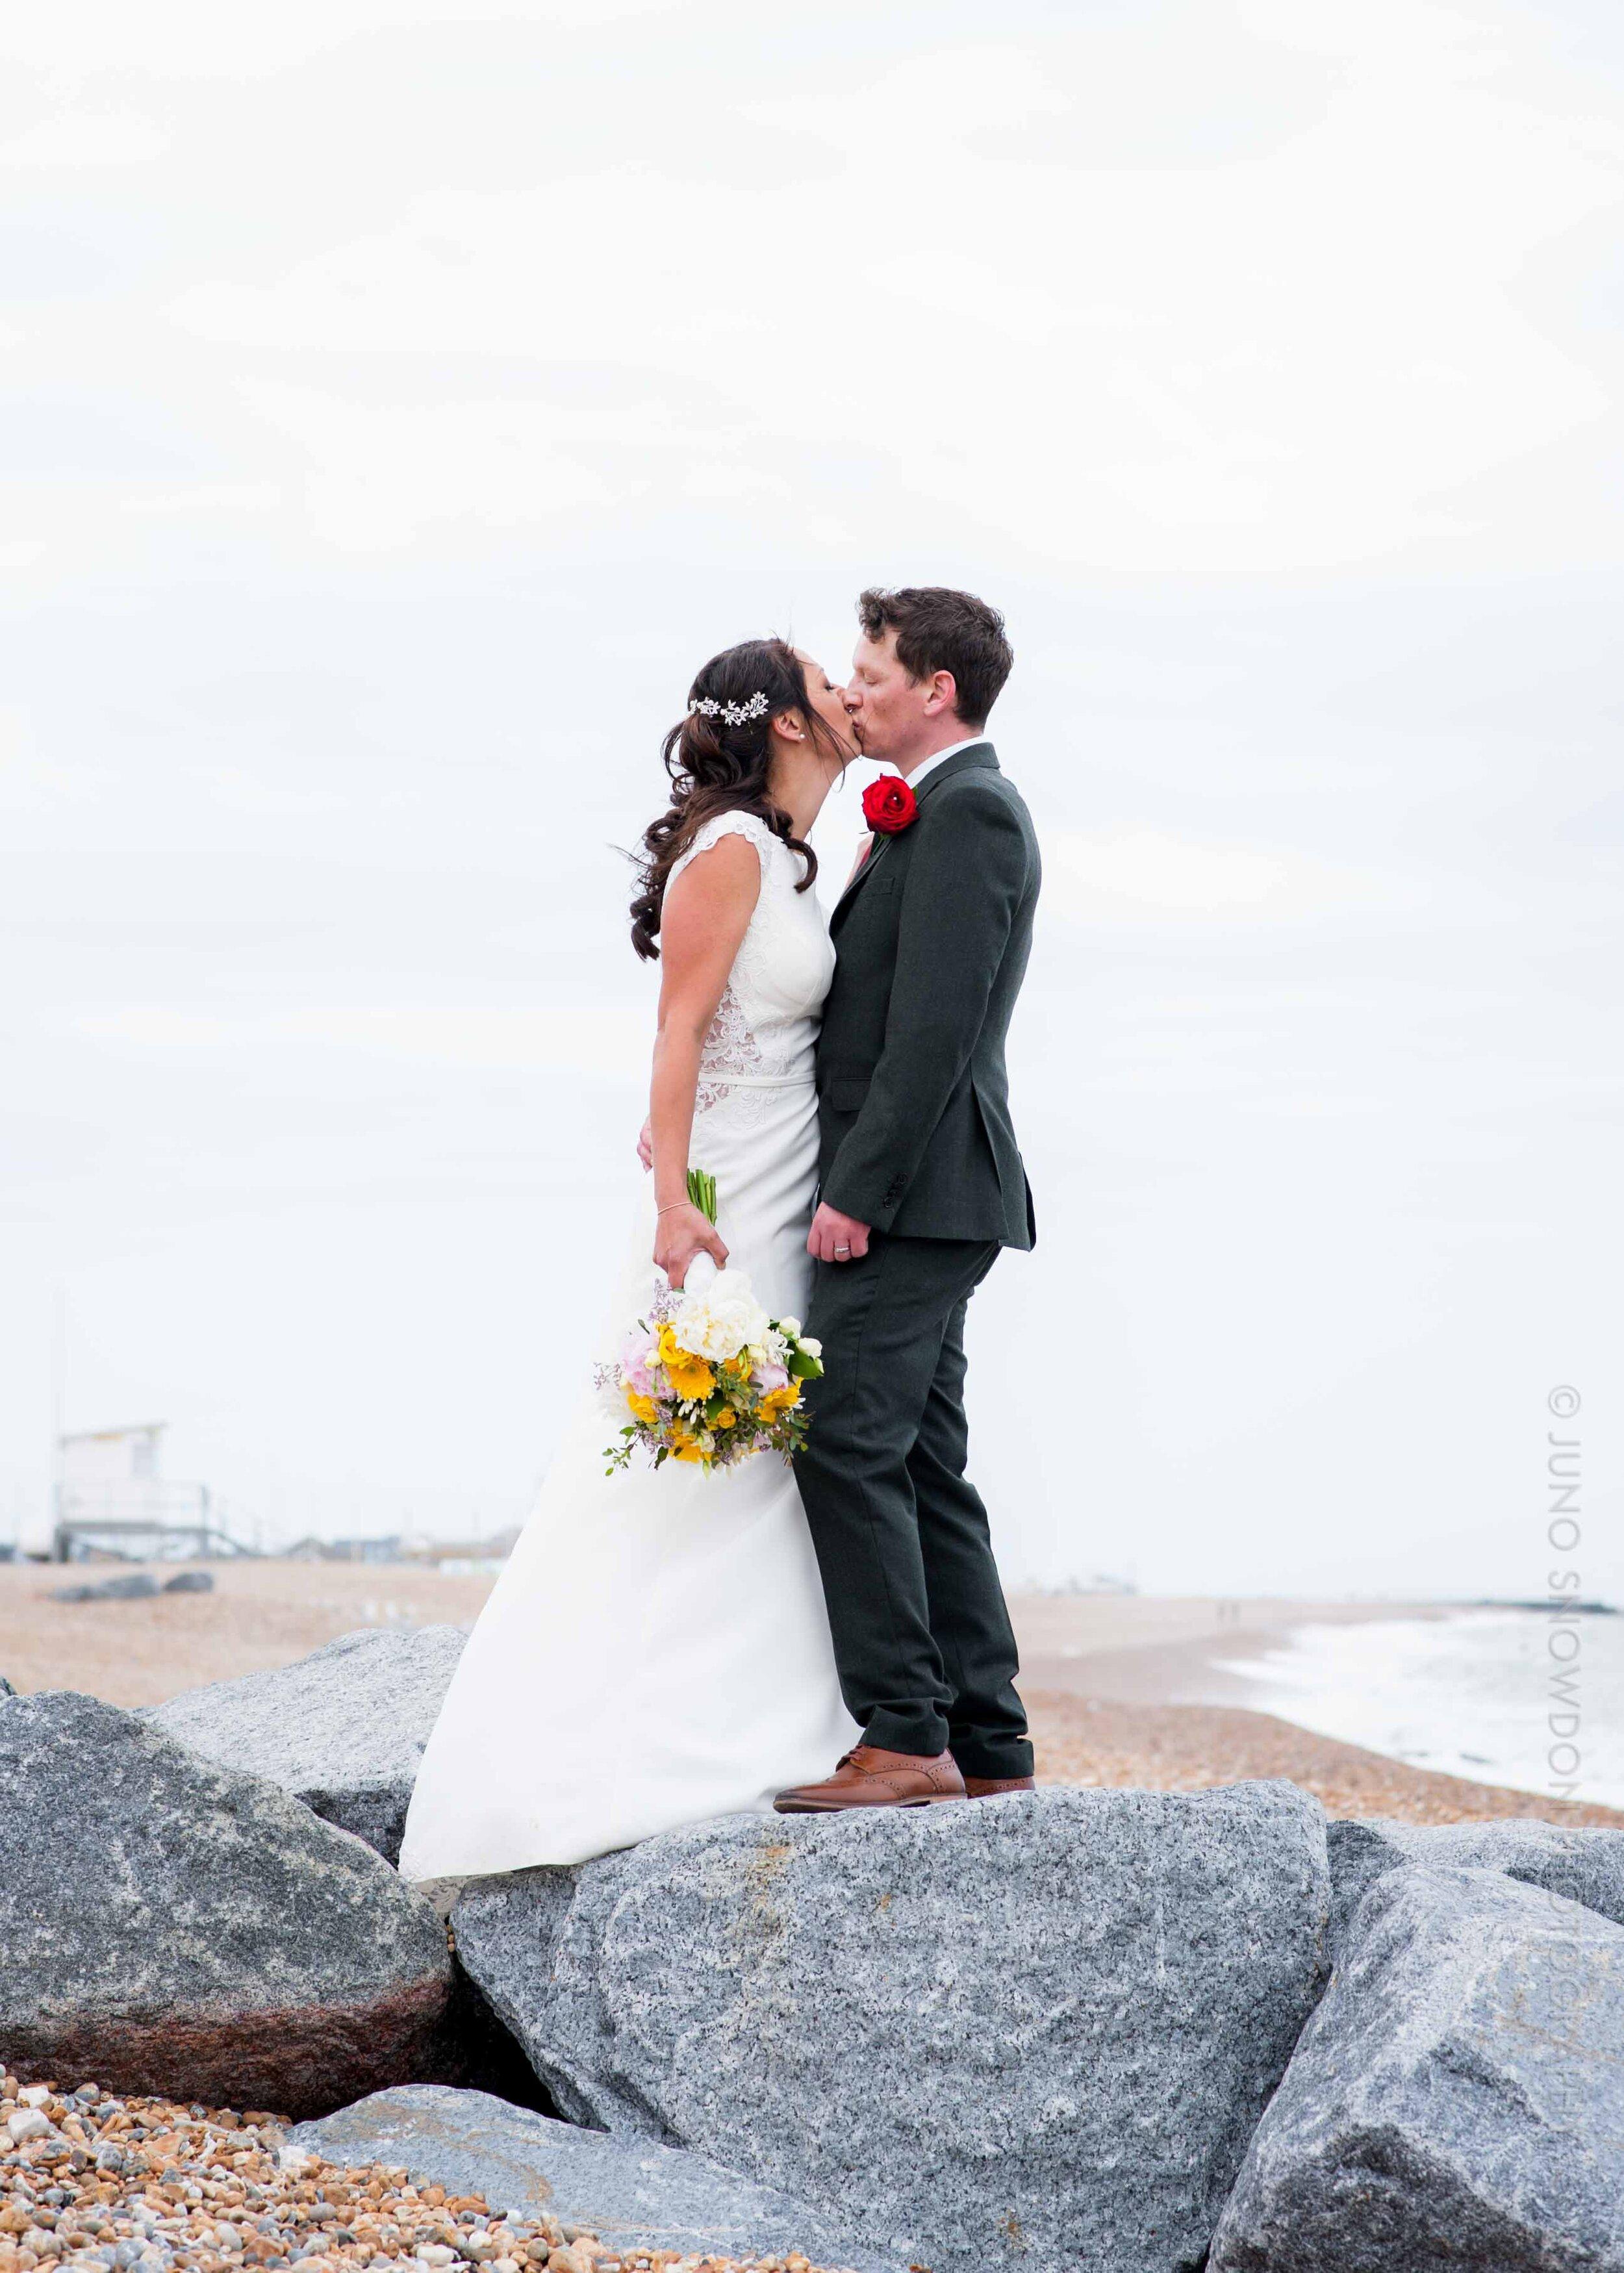 juno-snowdon-photography-wedding-0931.jpg